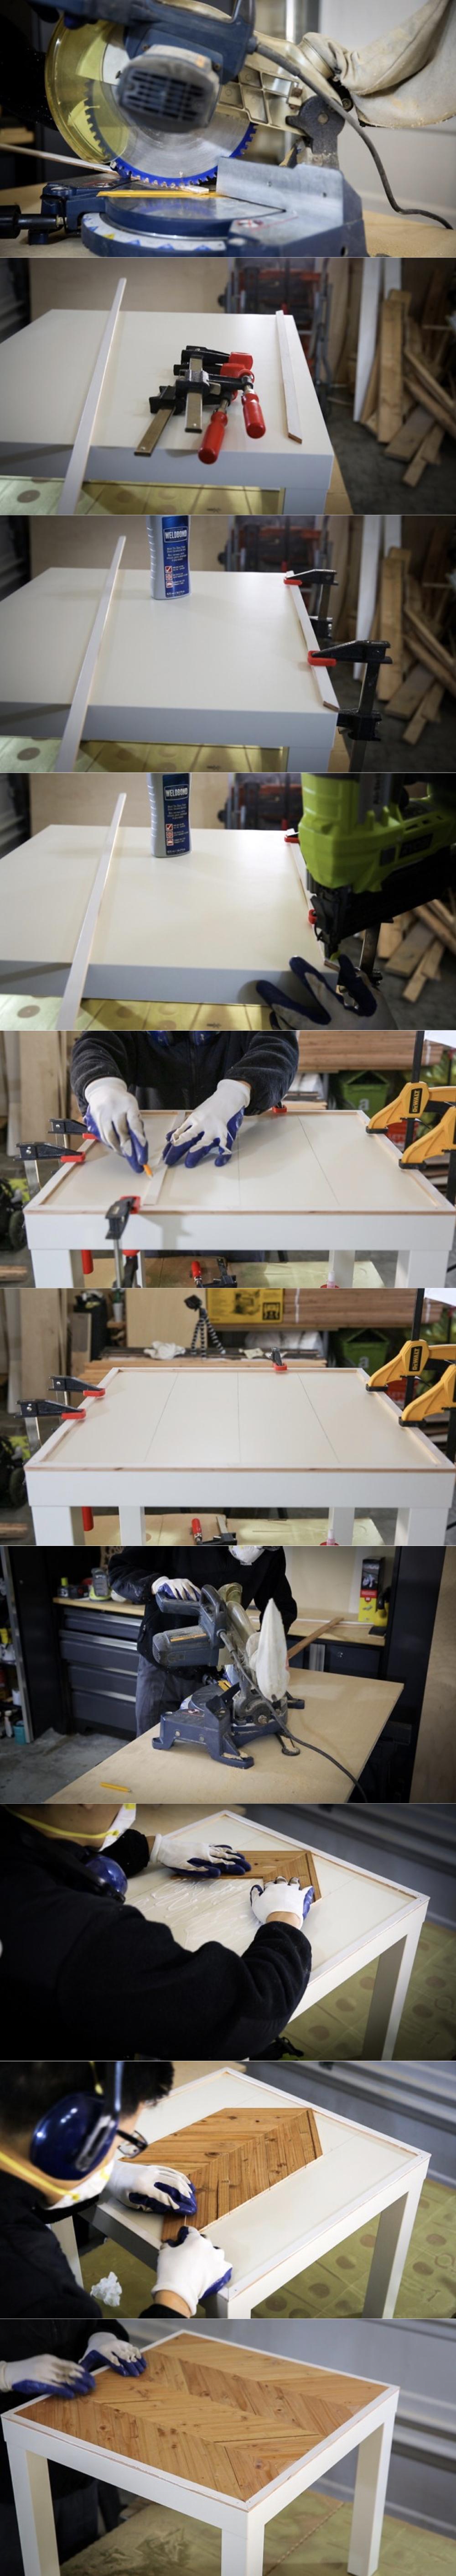 lack ikea hack table chic bricolage parquet - blog déco - clem around the corner